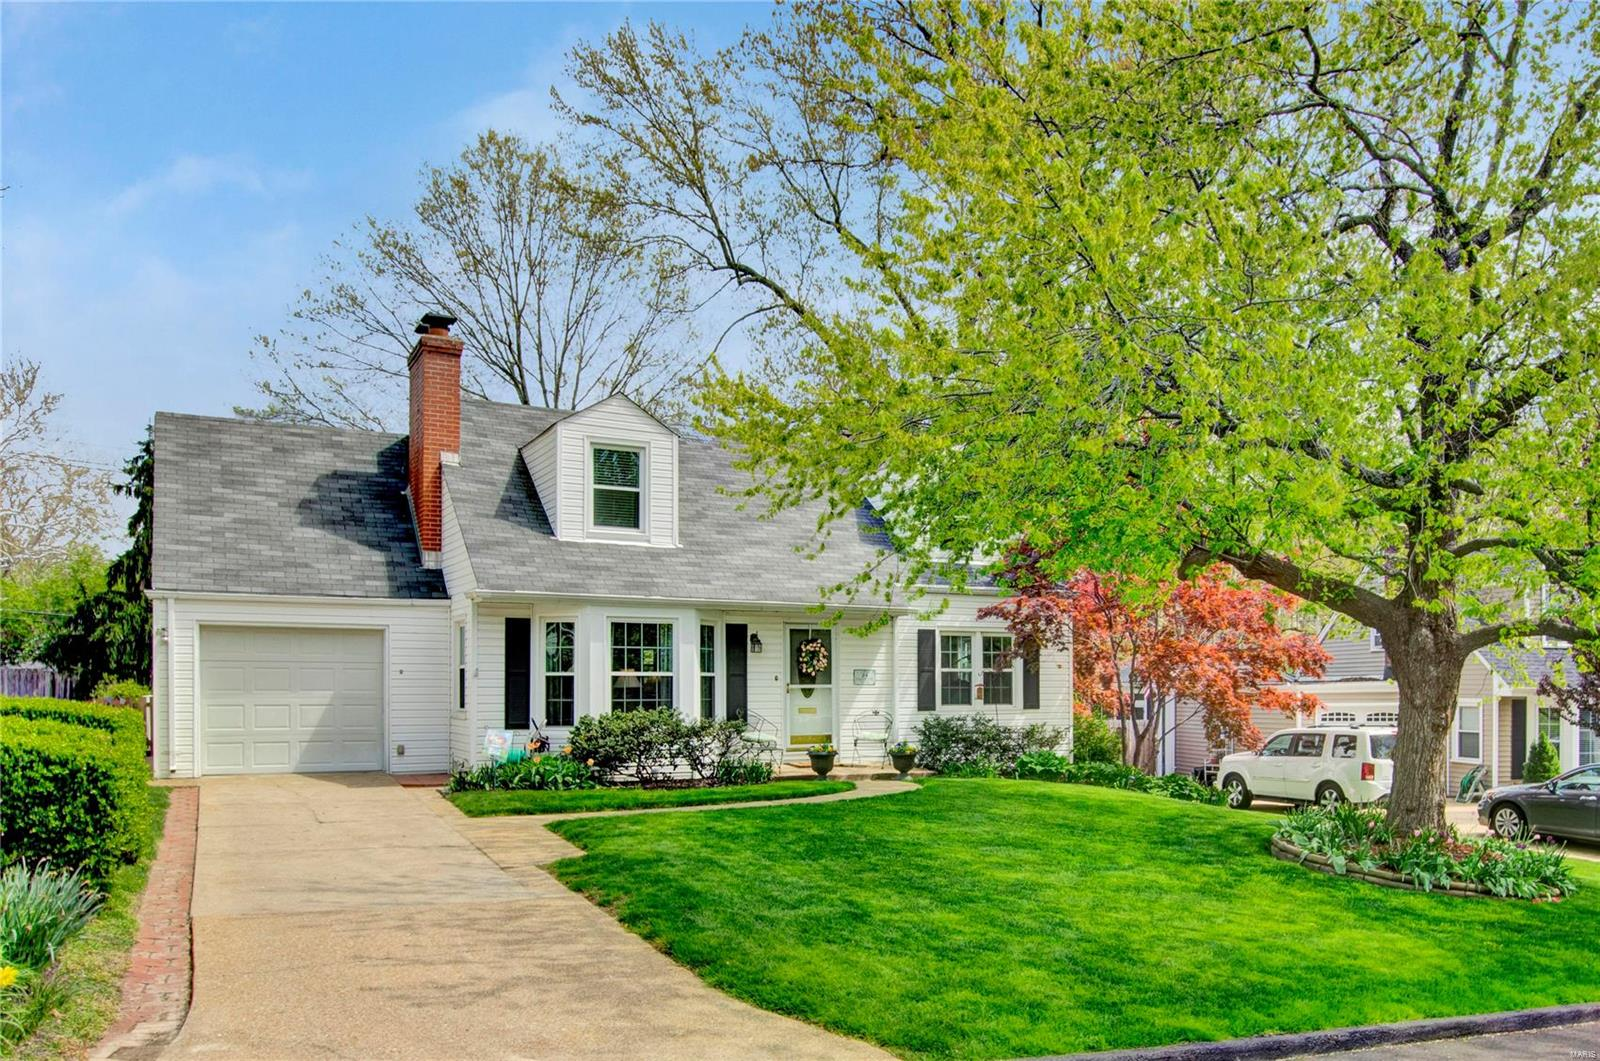 24 Cheyenne Court Property Photo - Glendale, MO real estate listing